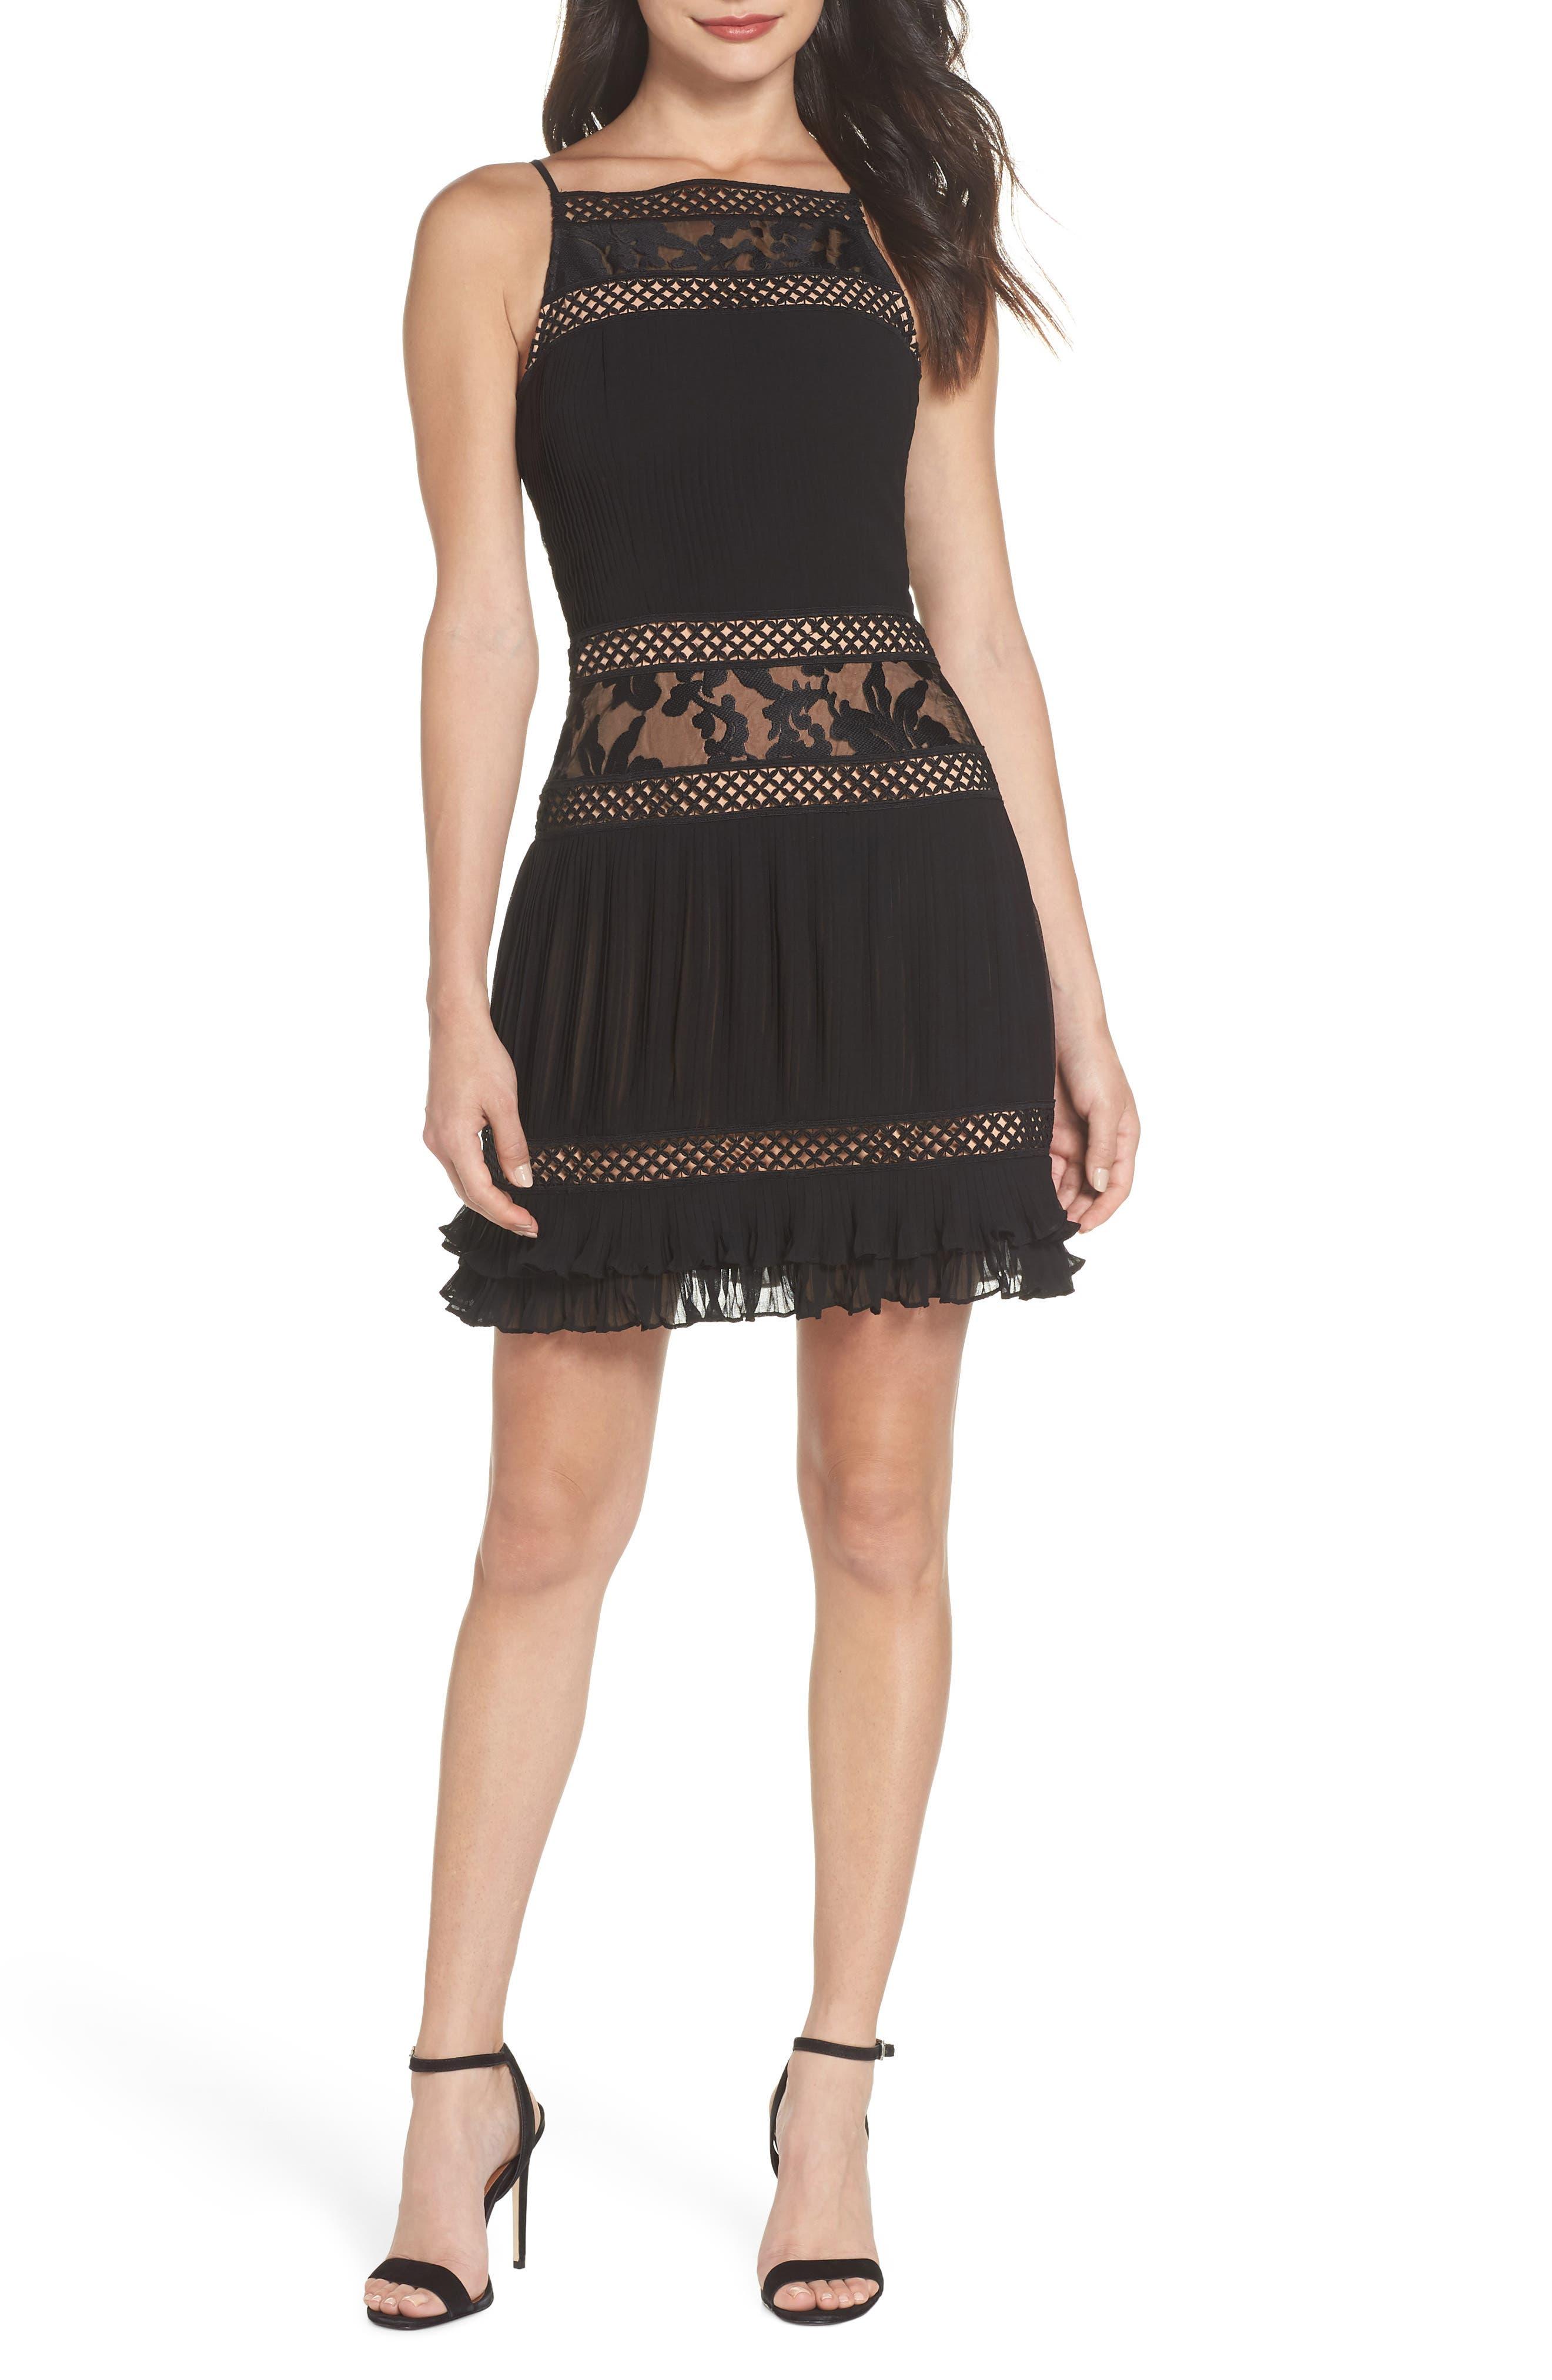 ADELYN RAE Nia Pleated A-Line Dress in Black